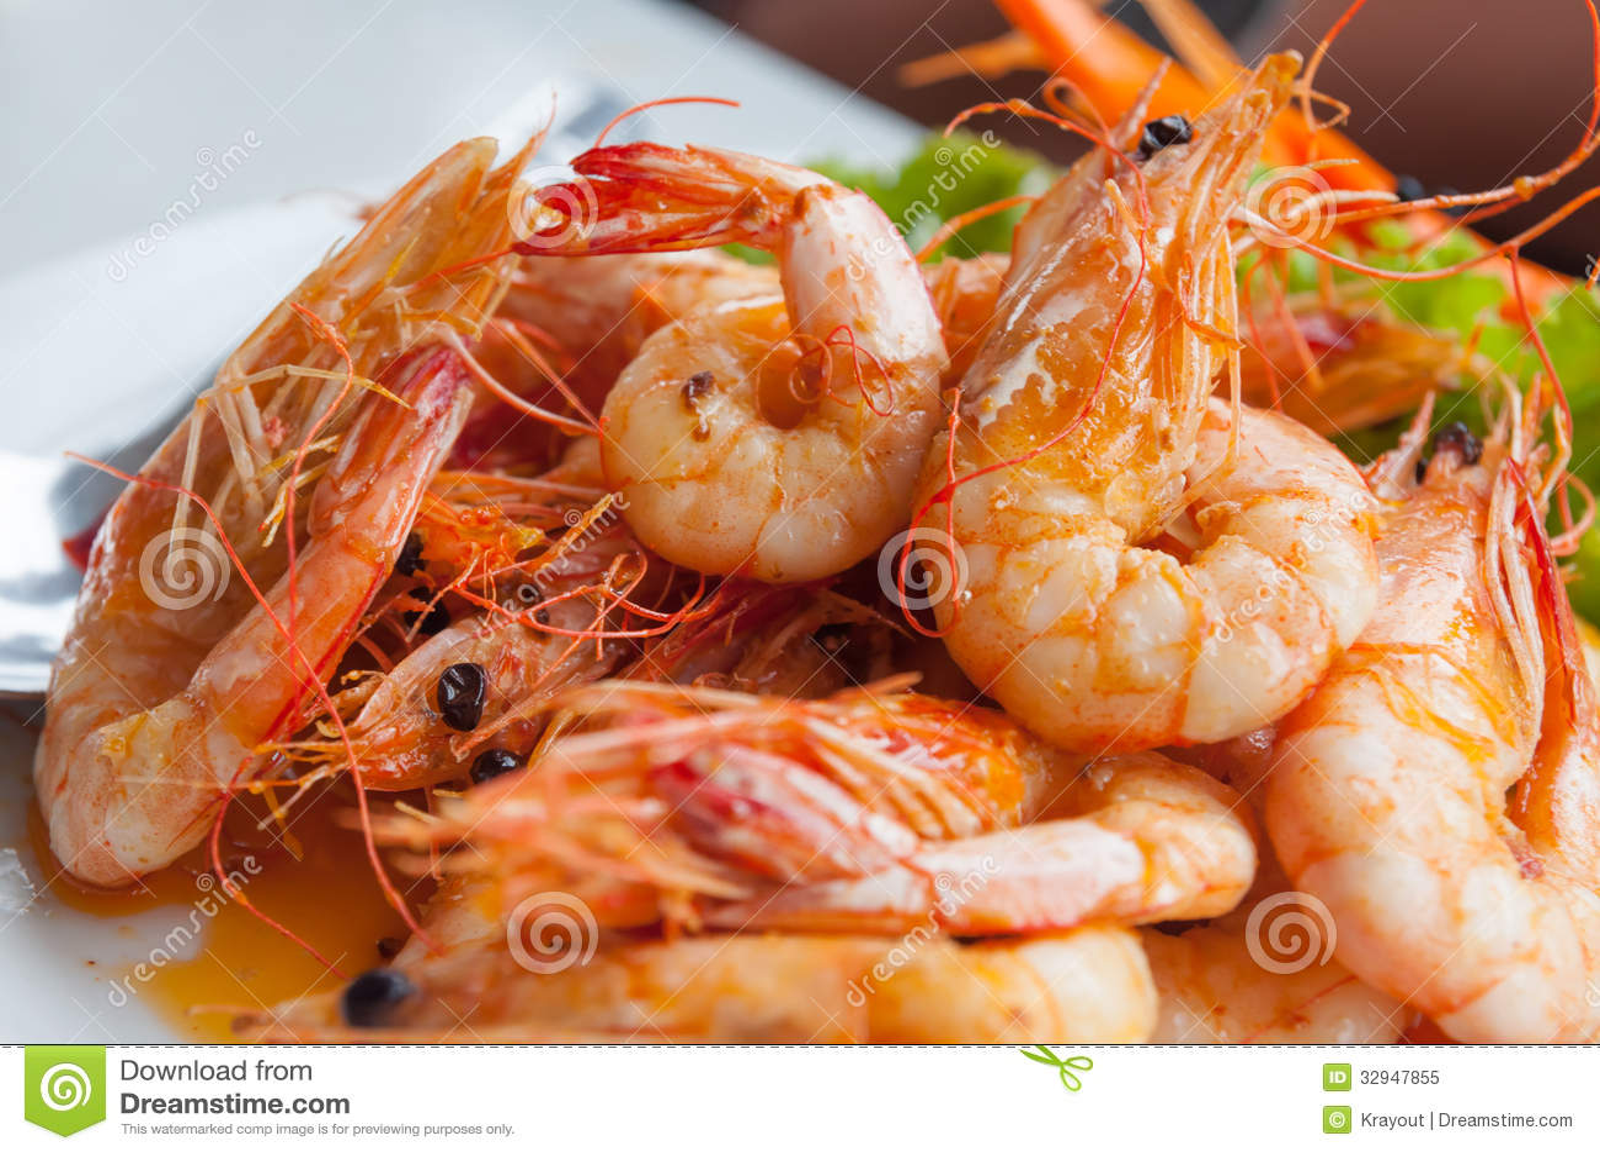 how to make a seafood bake